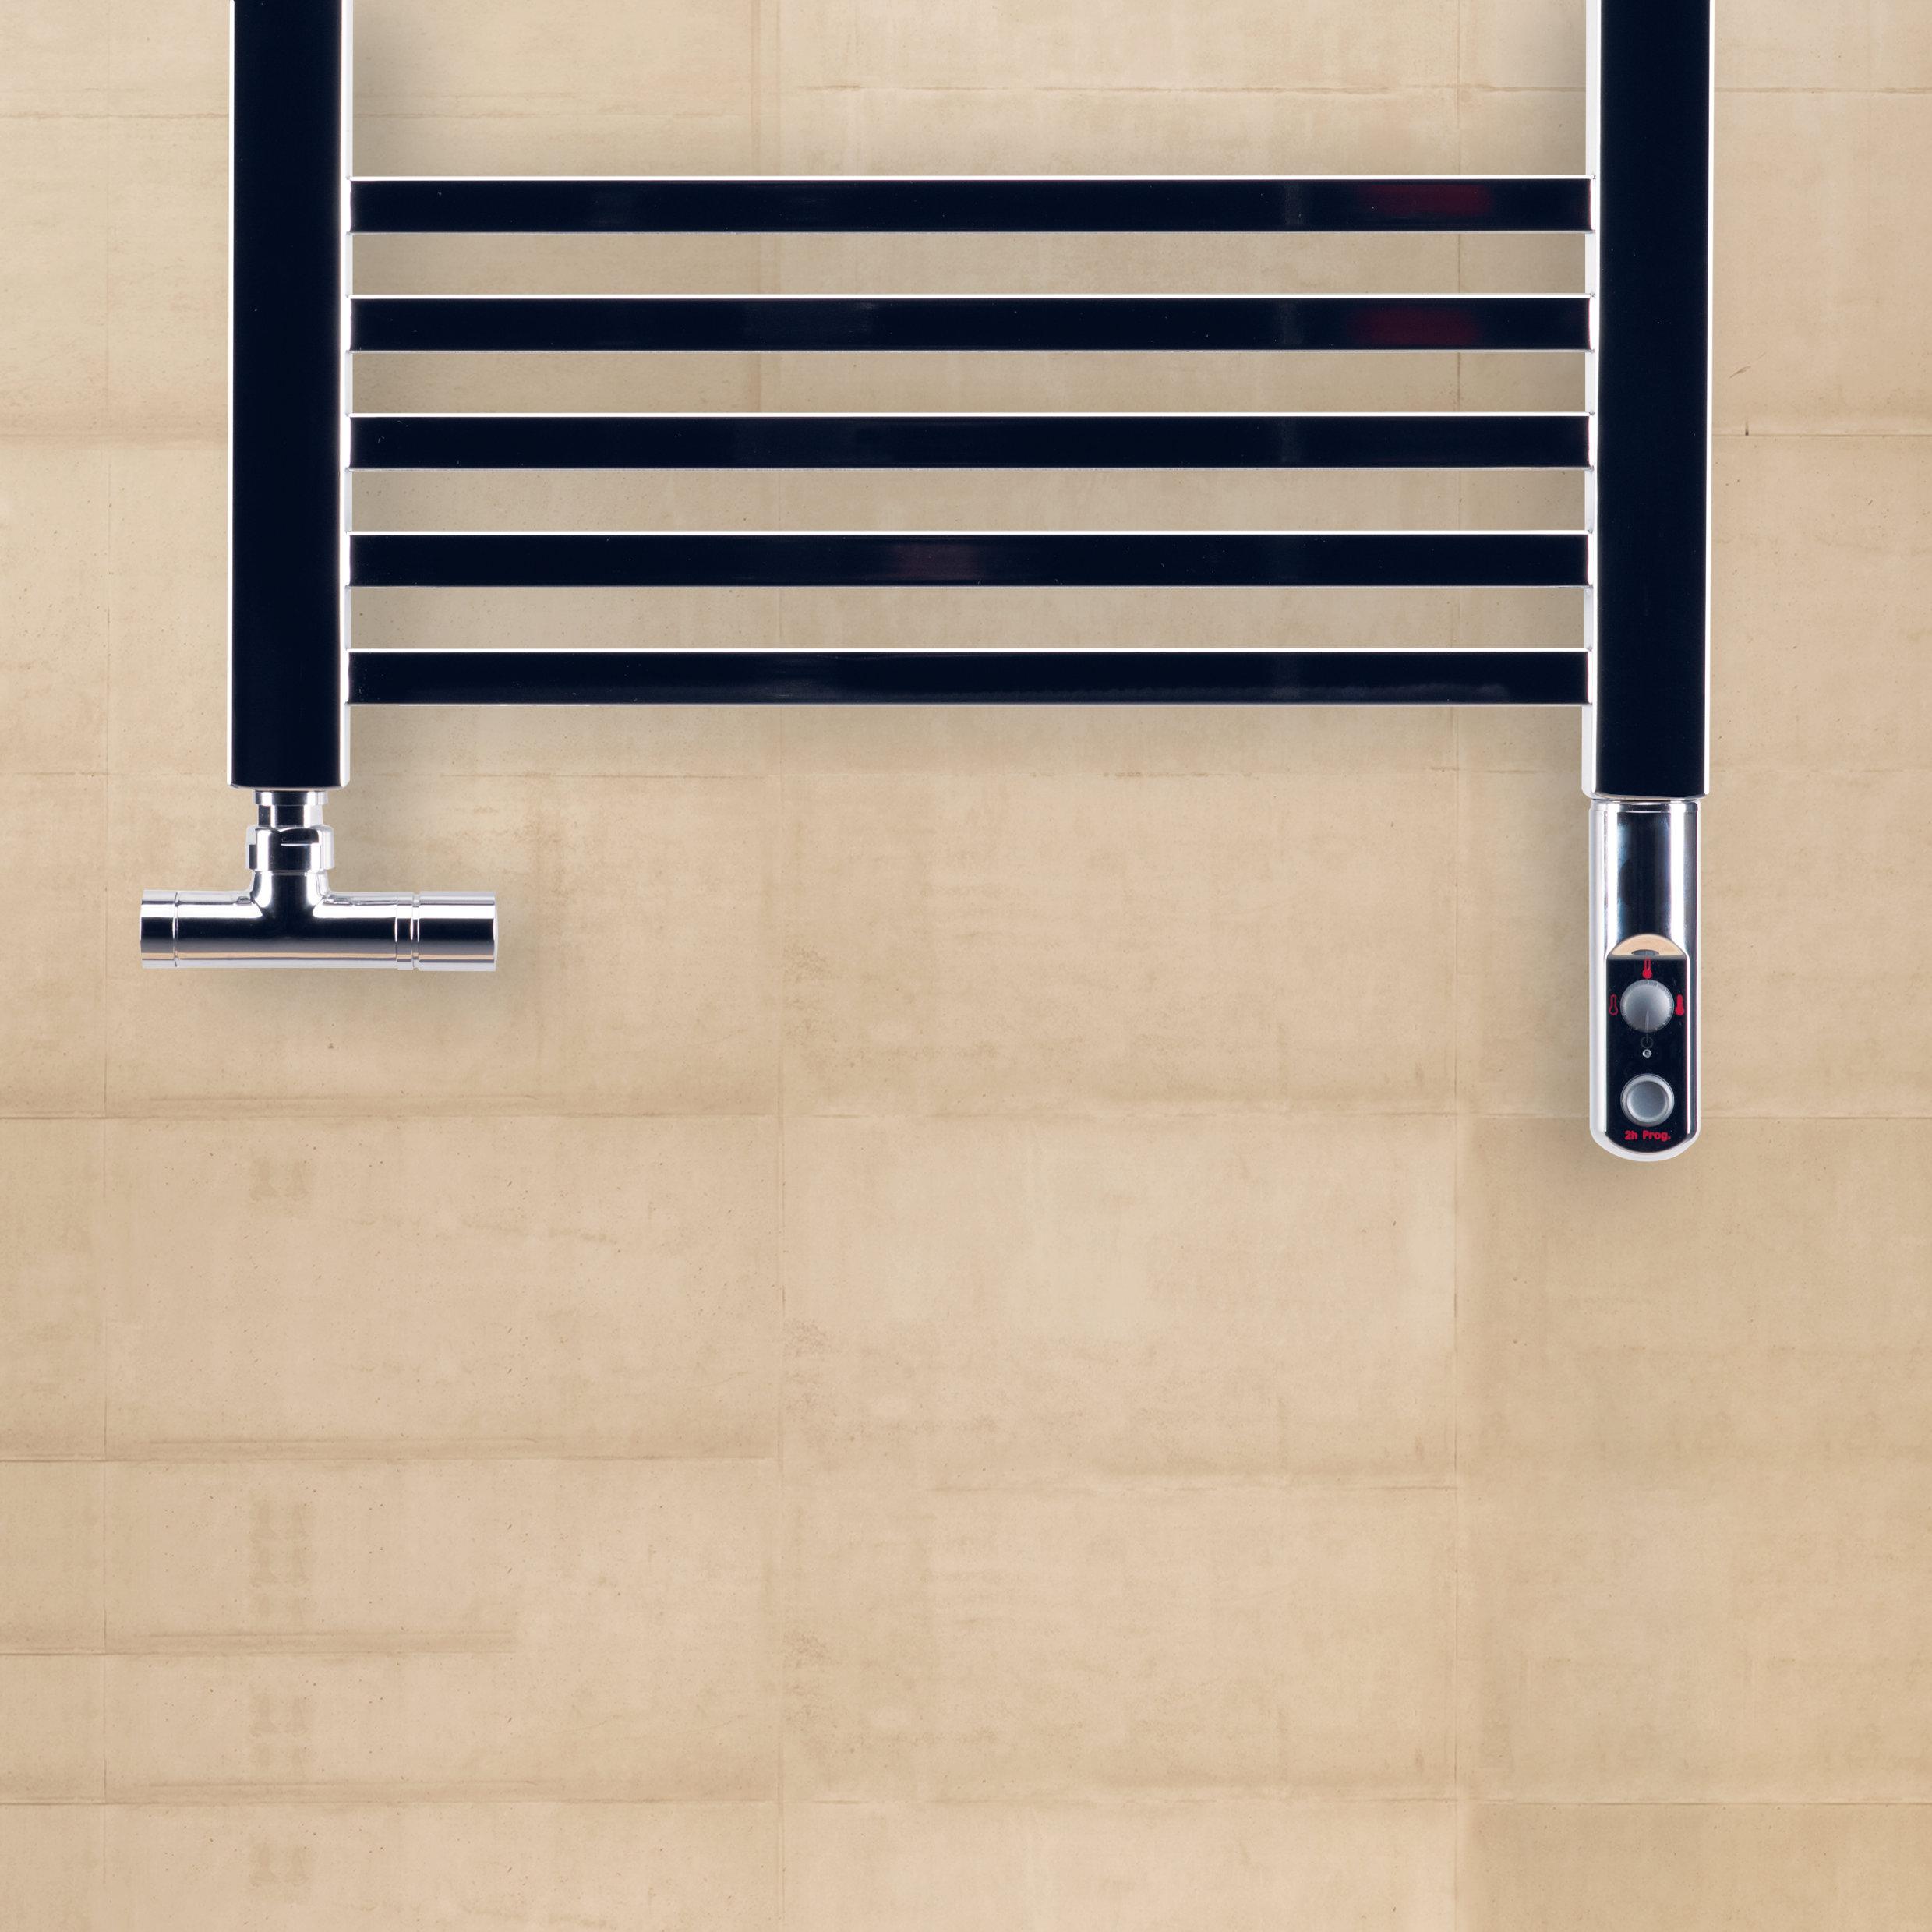 Zehnder Impa furdoszobai dizajn radiator bekotes egy egy oldalon egy szeleptesttel